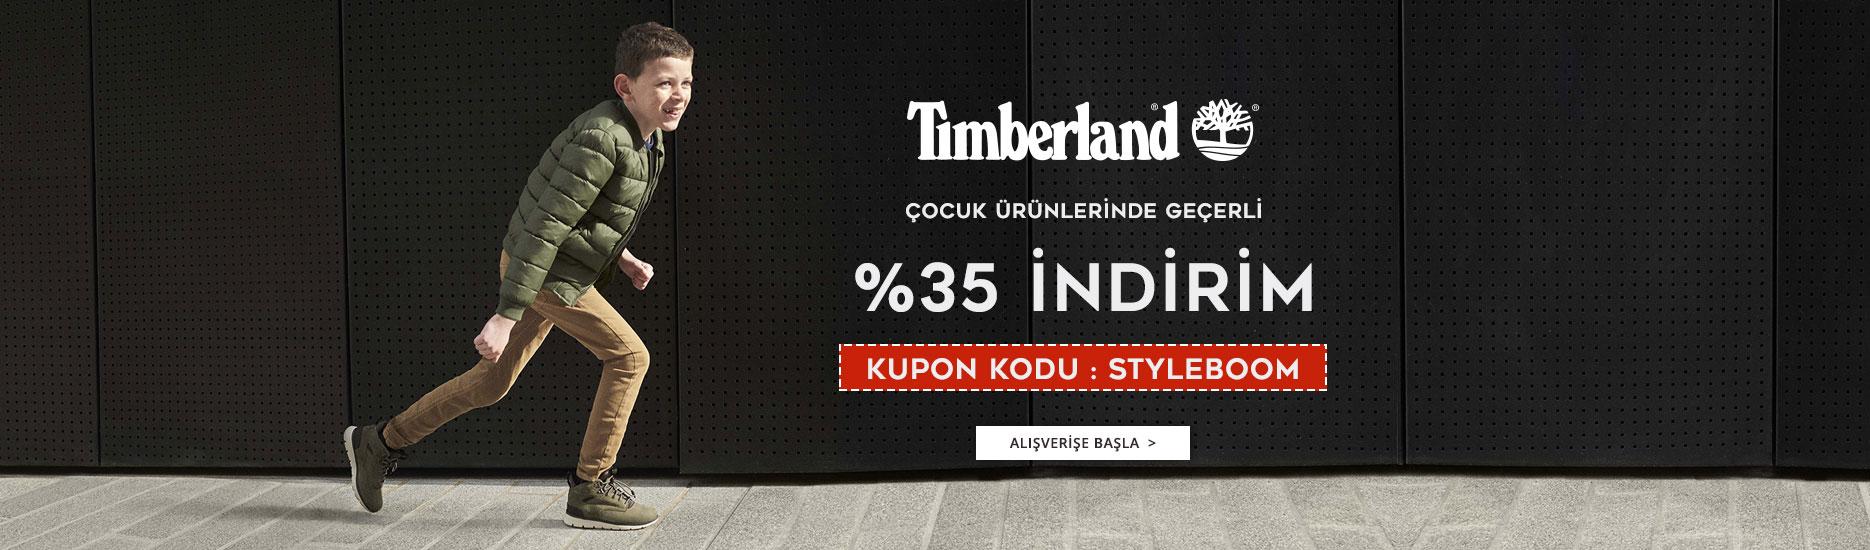 timberland-cocuk-indirim